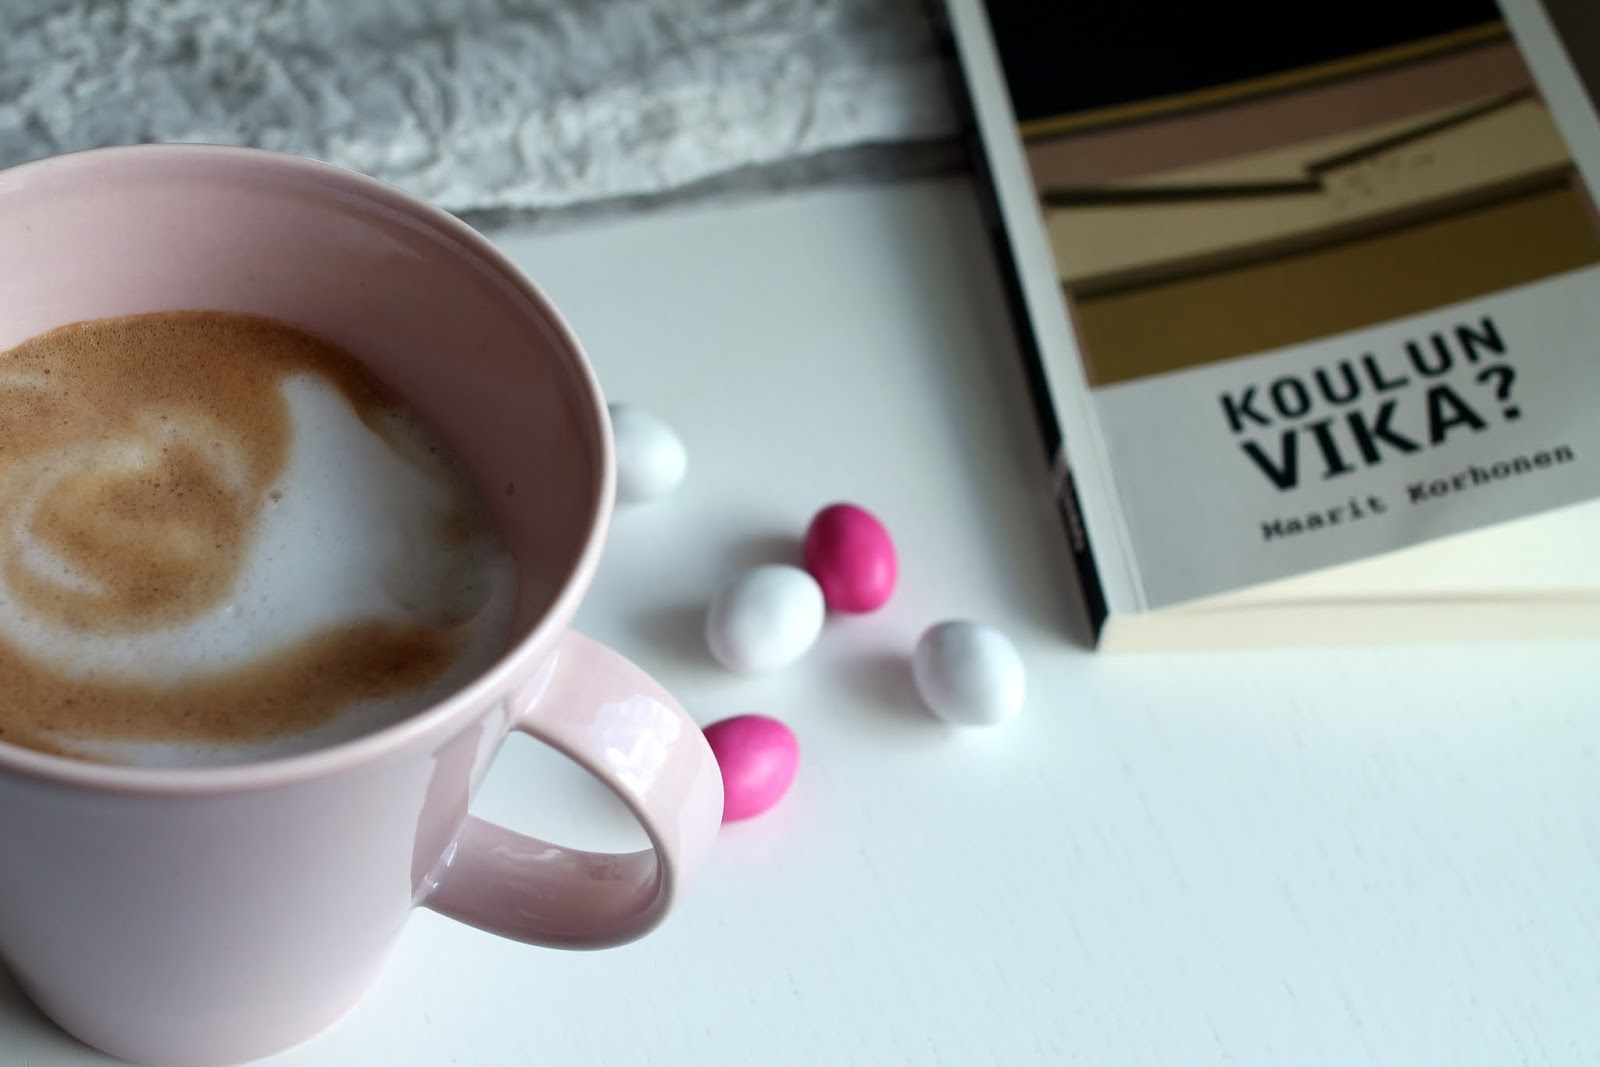 koulun vika korhonen kotitekoinen cappuccino